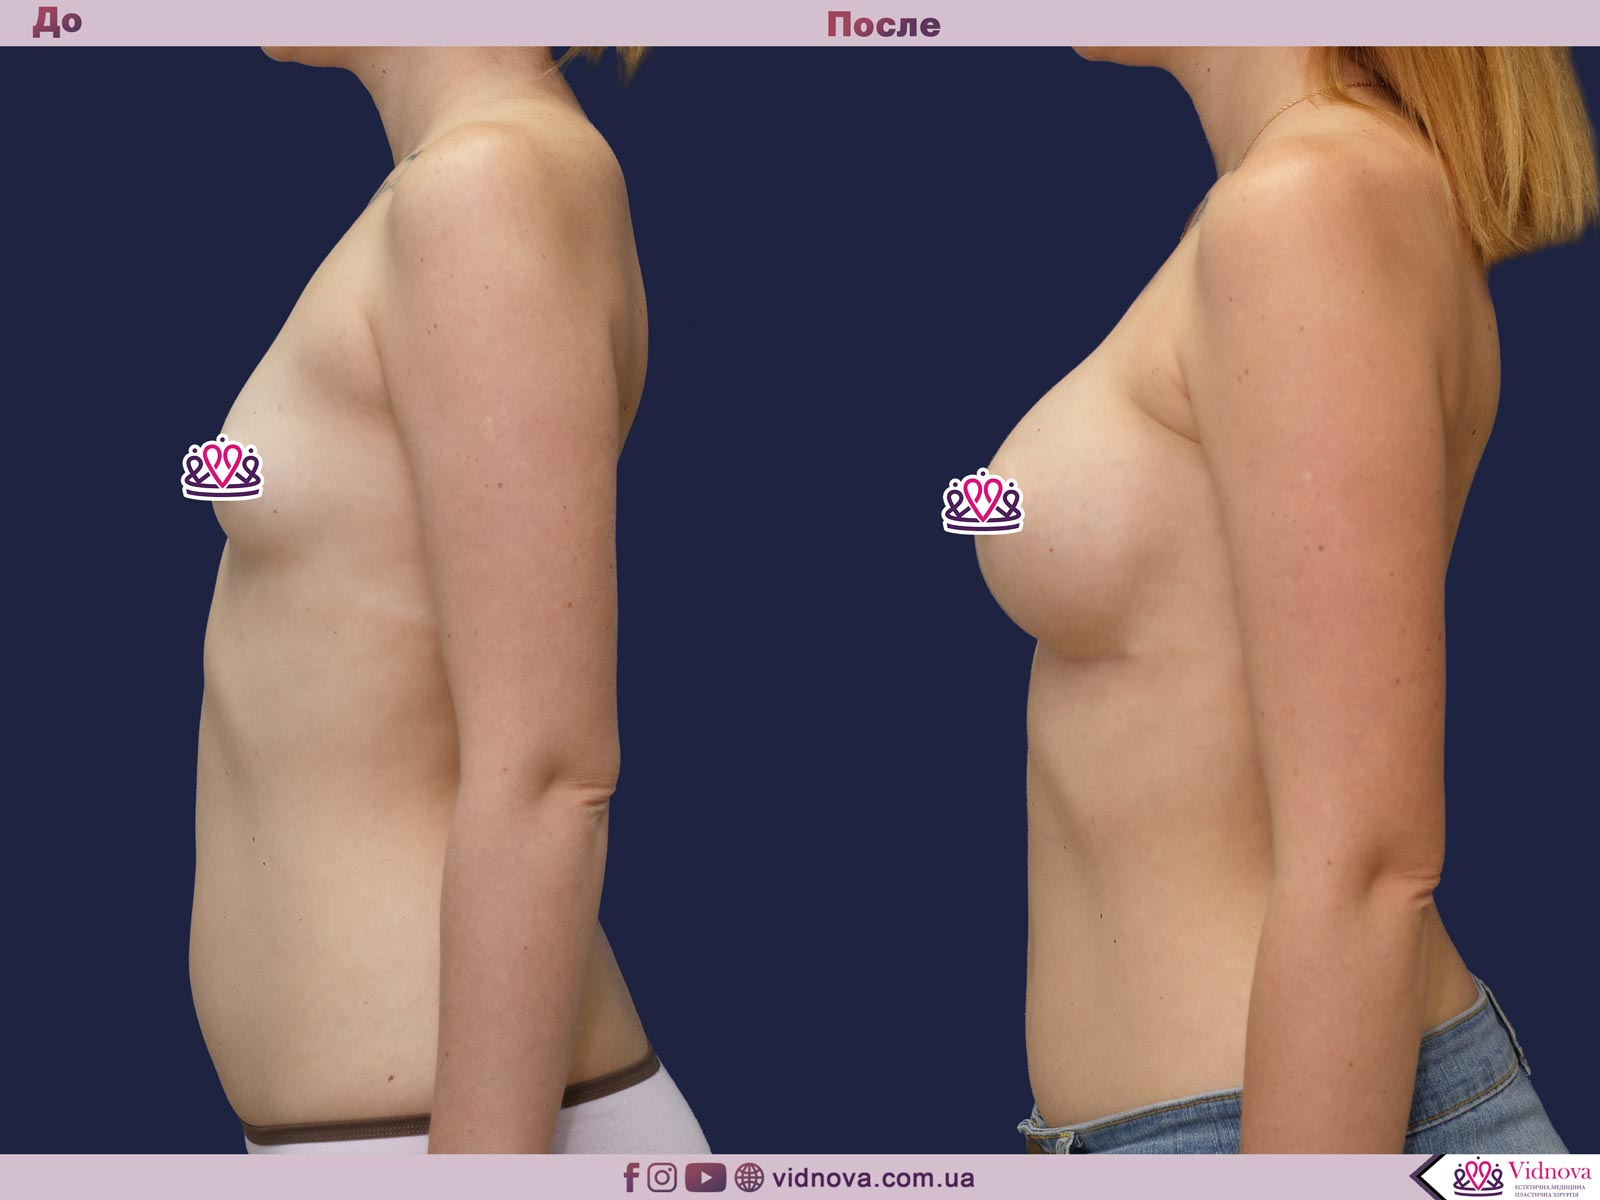 Увеличение груди: Фото ДО и ПОСЛЕ - Пример №61-3 - Клиника Vidnova